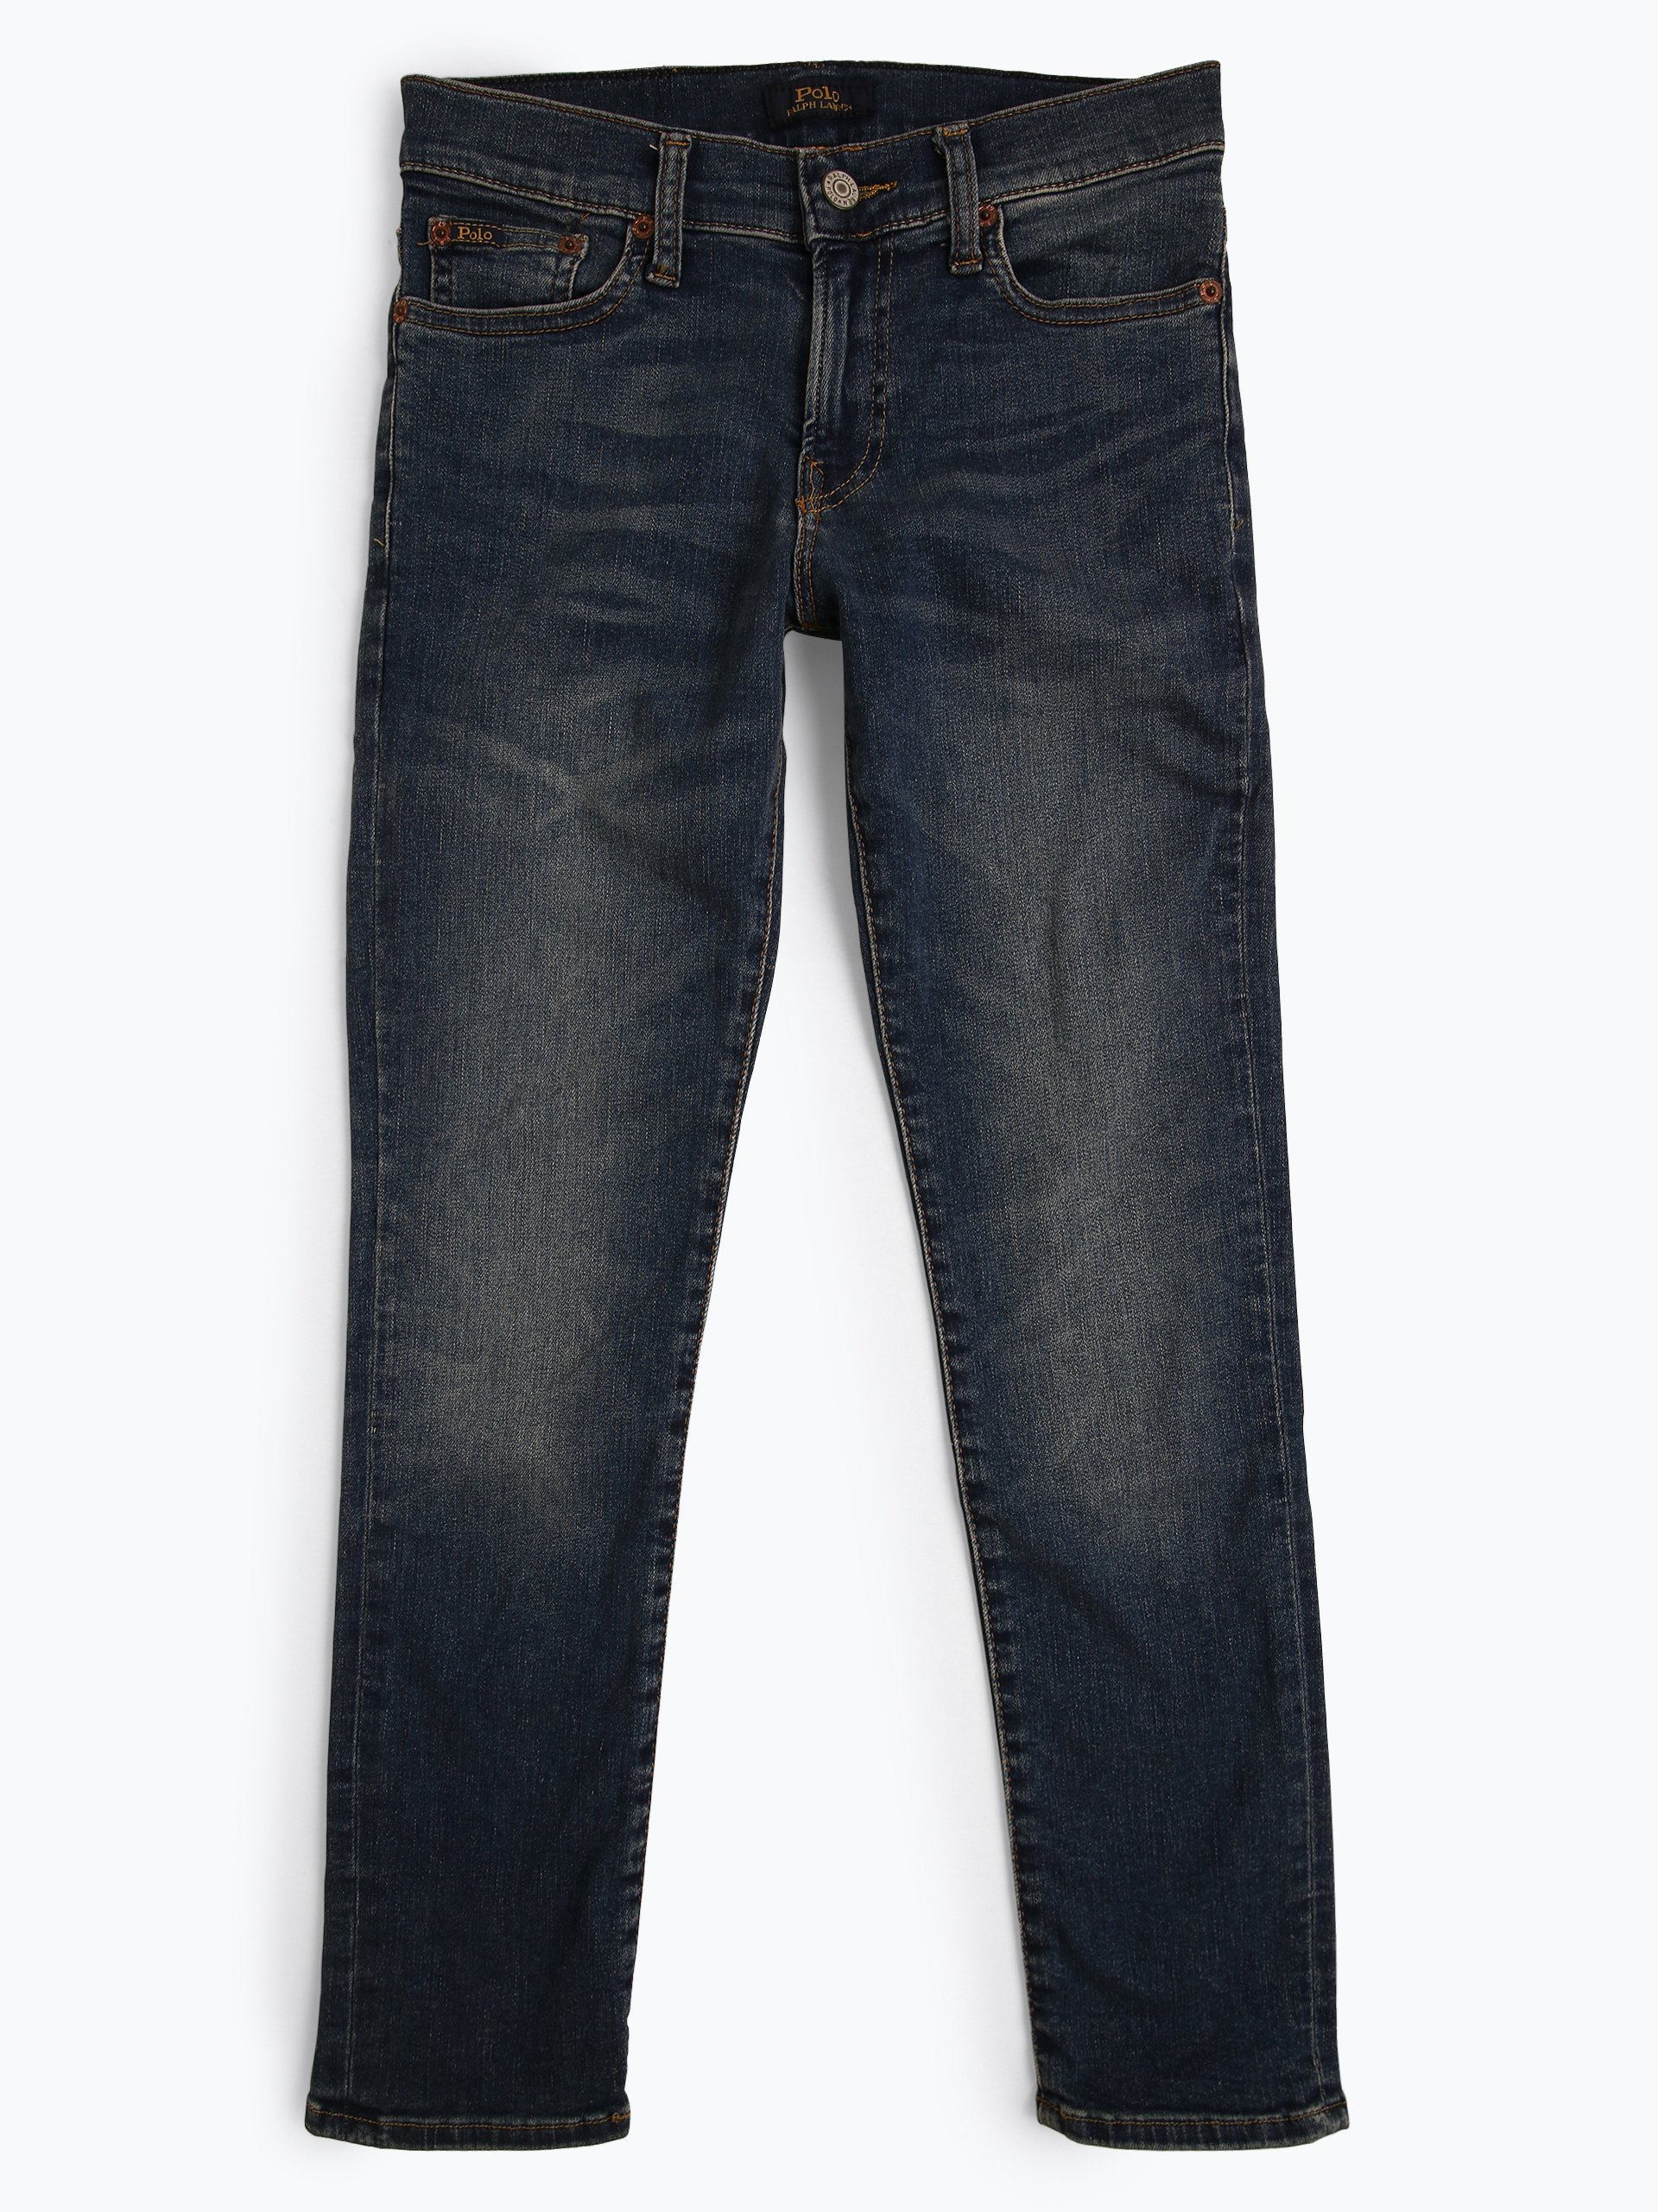 Polo Ralph Lauren Jungen Jeans Skinny Fit